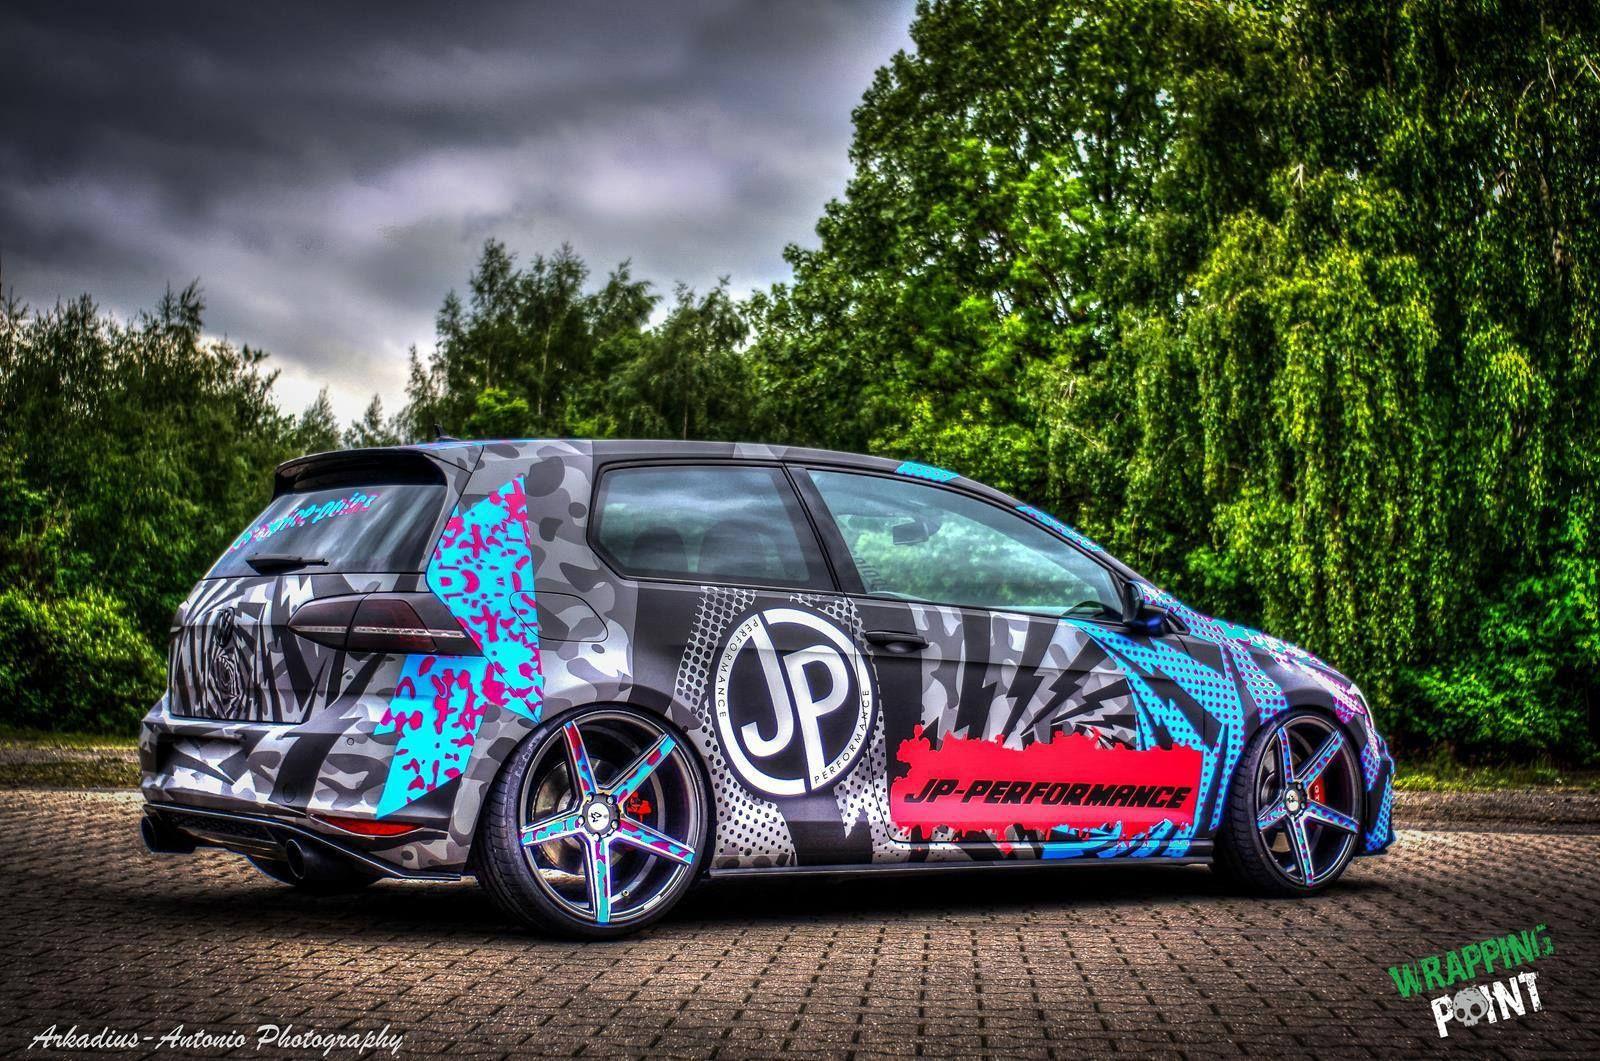 Jp Performance Gti Wrap  Wrapfolio  Yoo Wrap  Pinterest